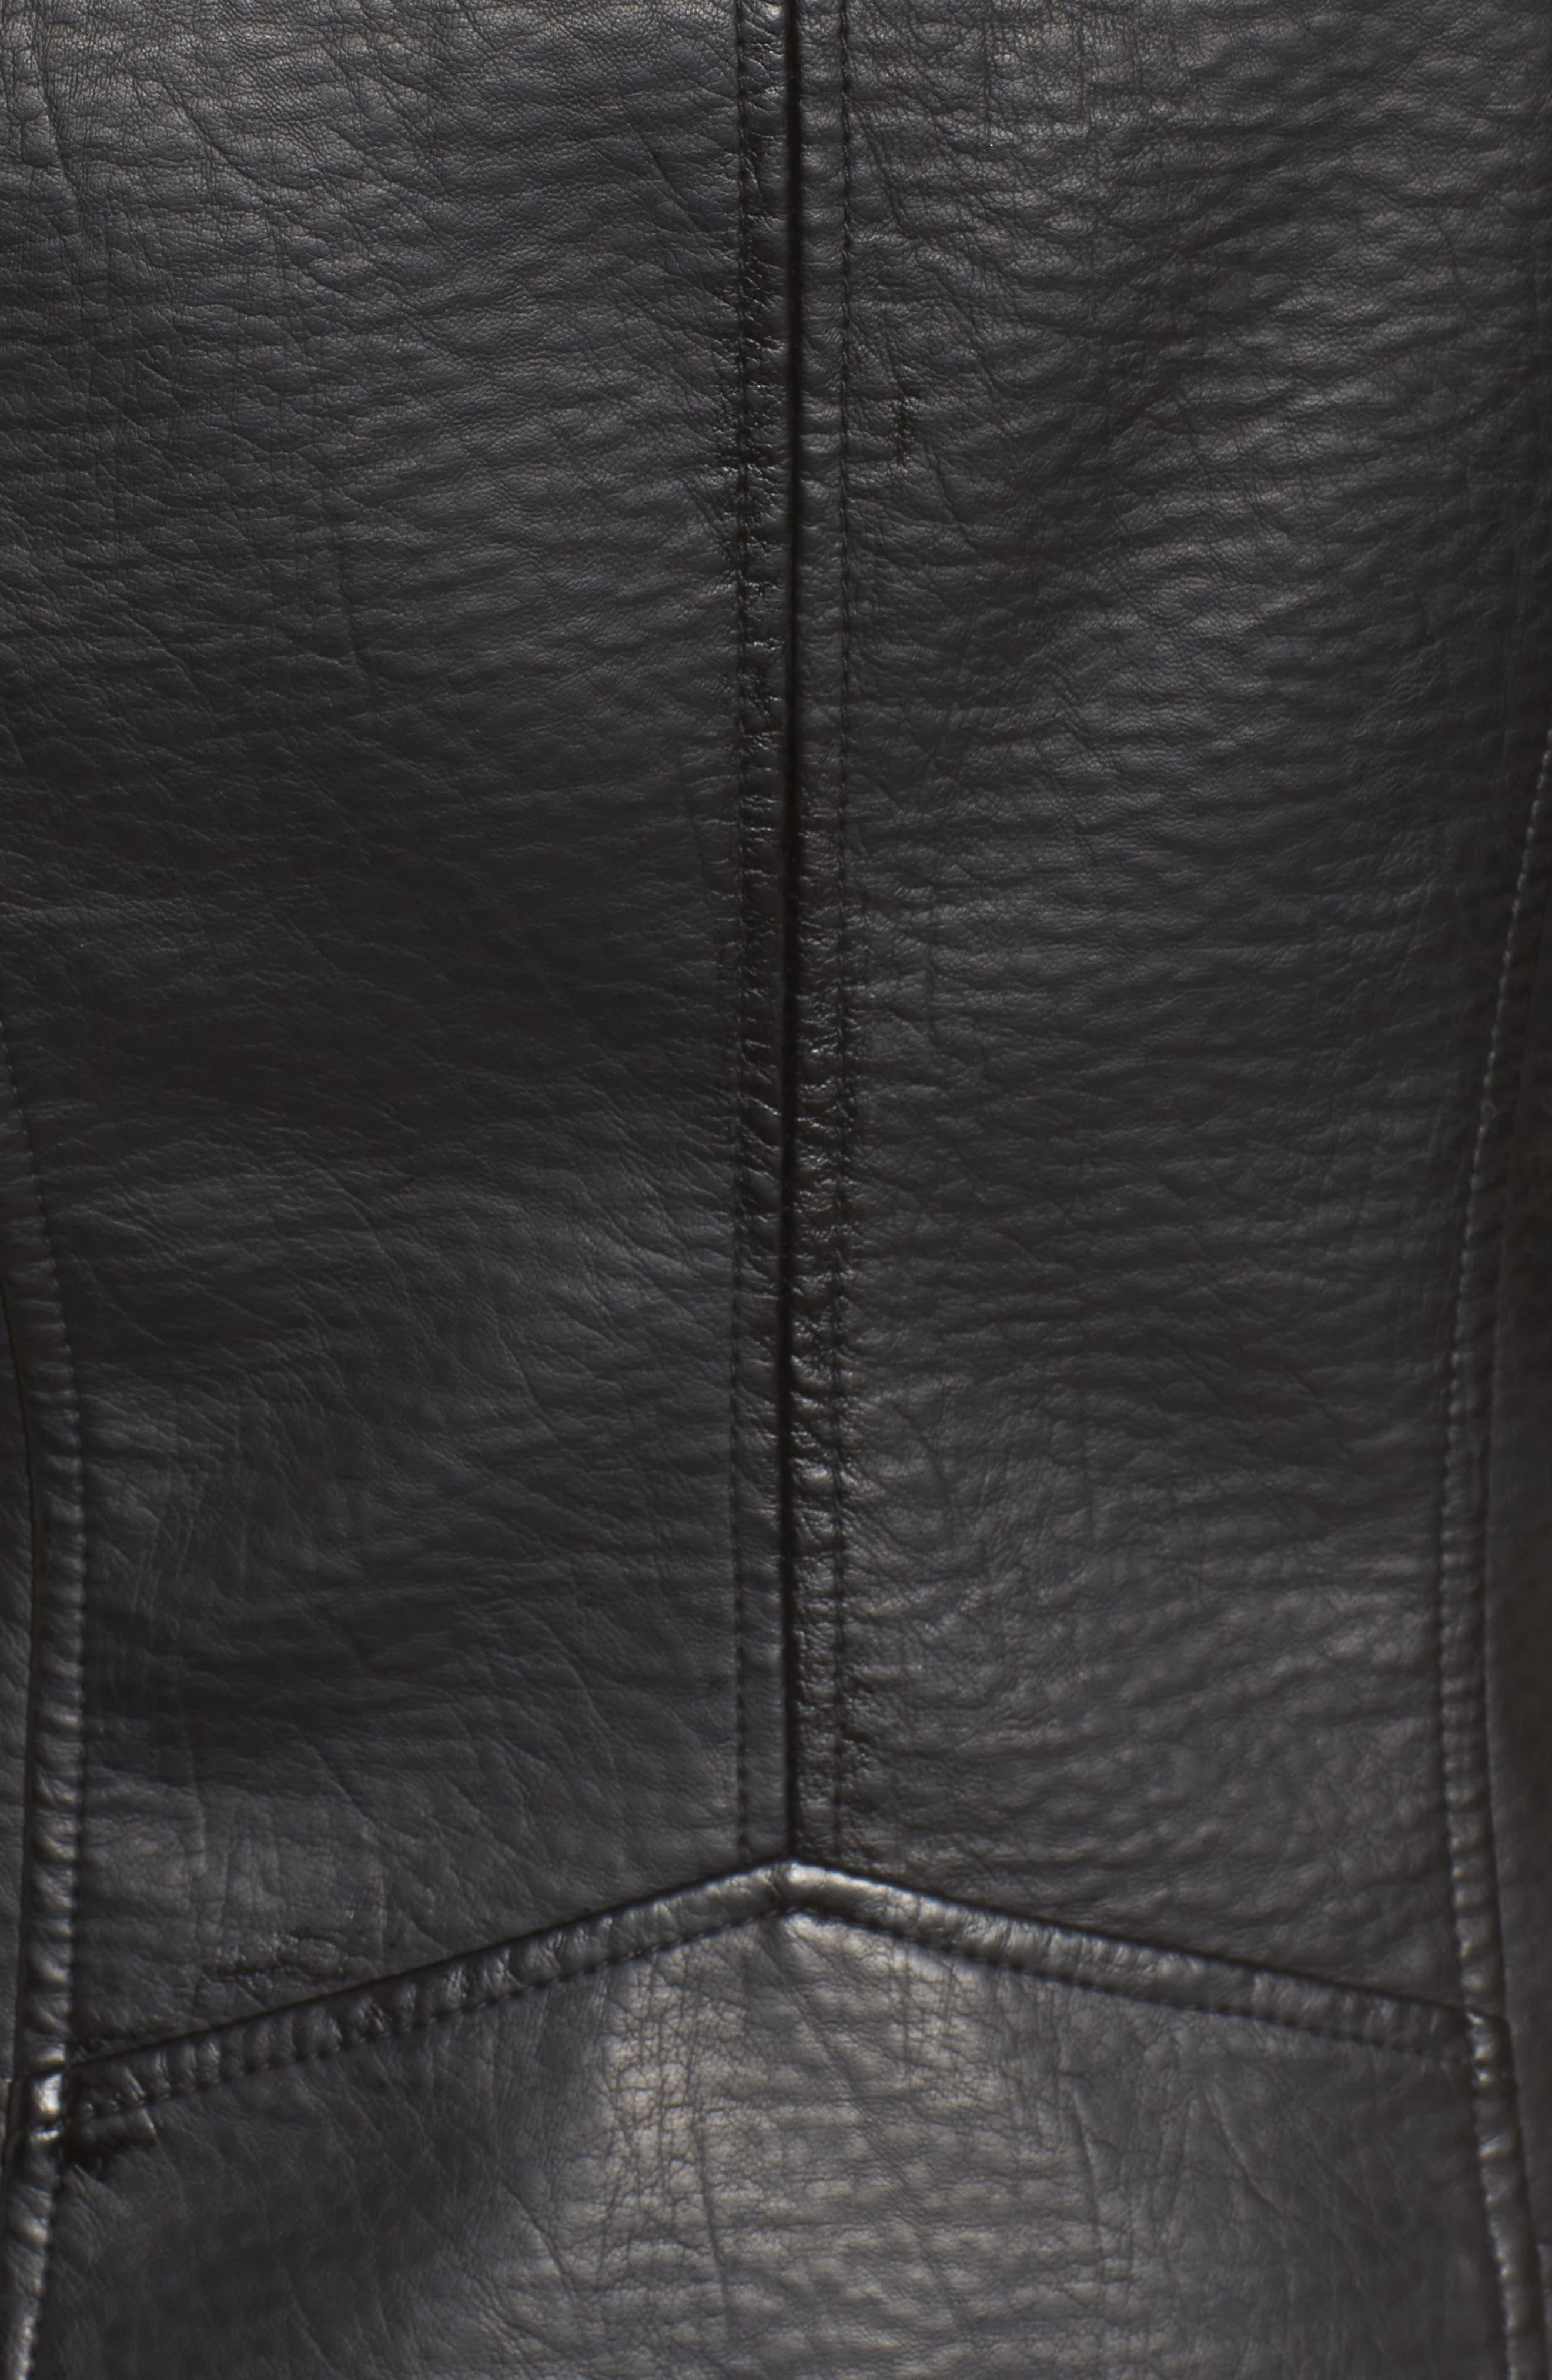 Textured Faux Leather Jacket with Removable Faux Fur Trim,                             Alternate thumbnail 6, color,                             001